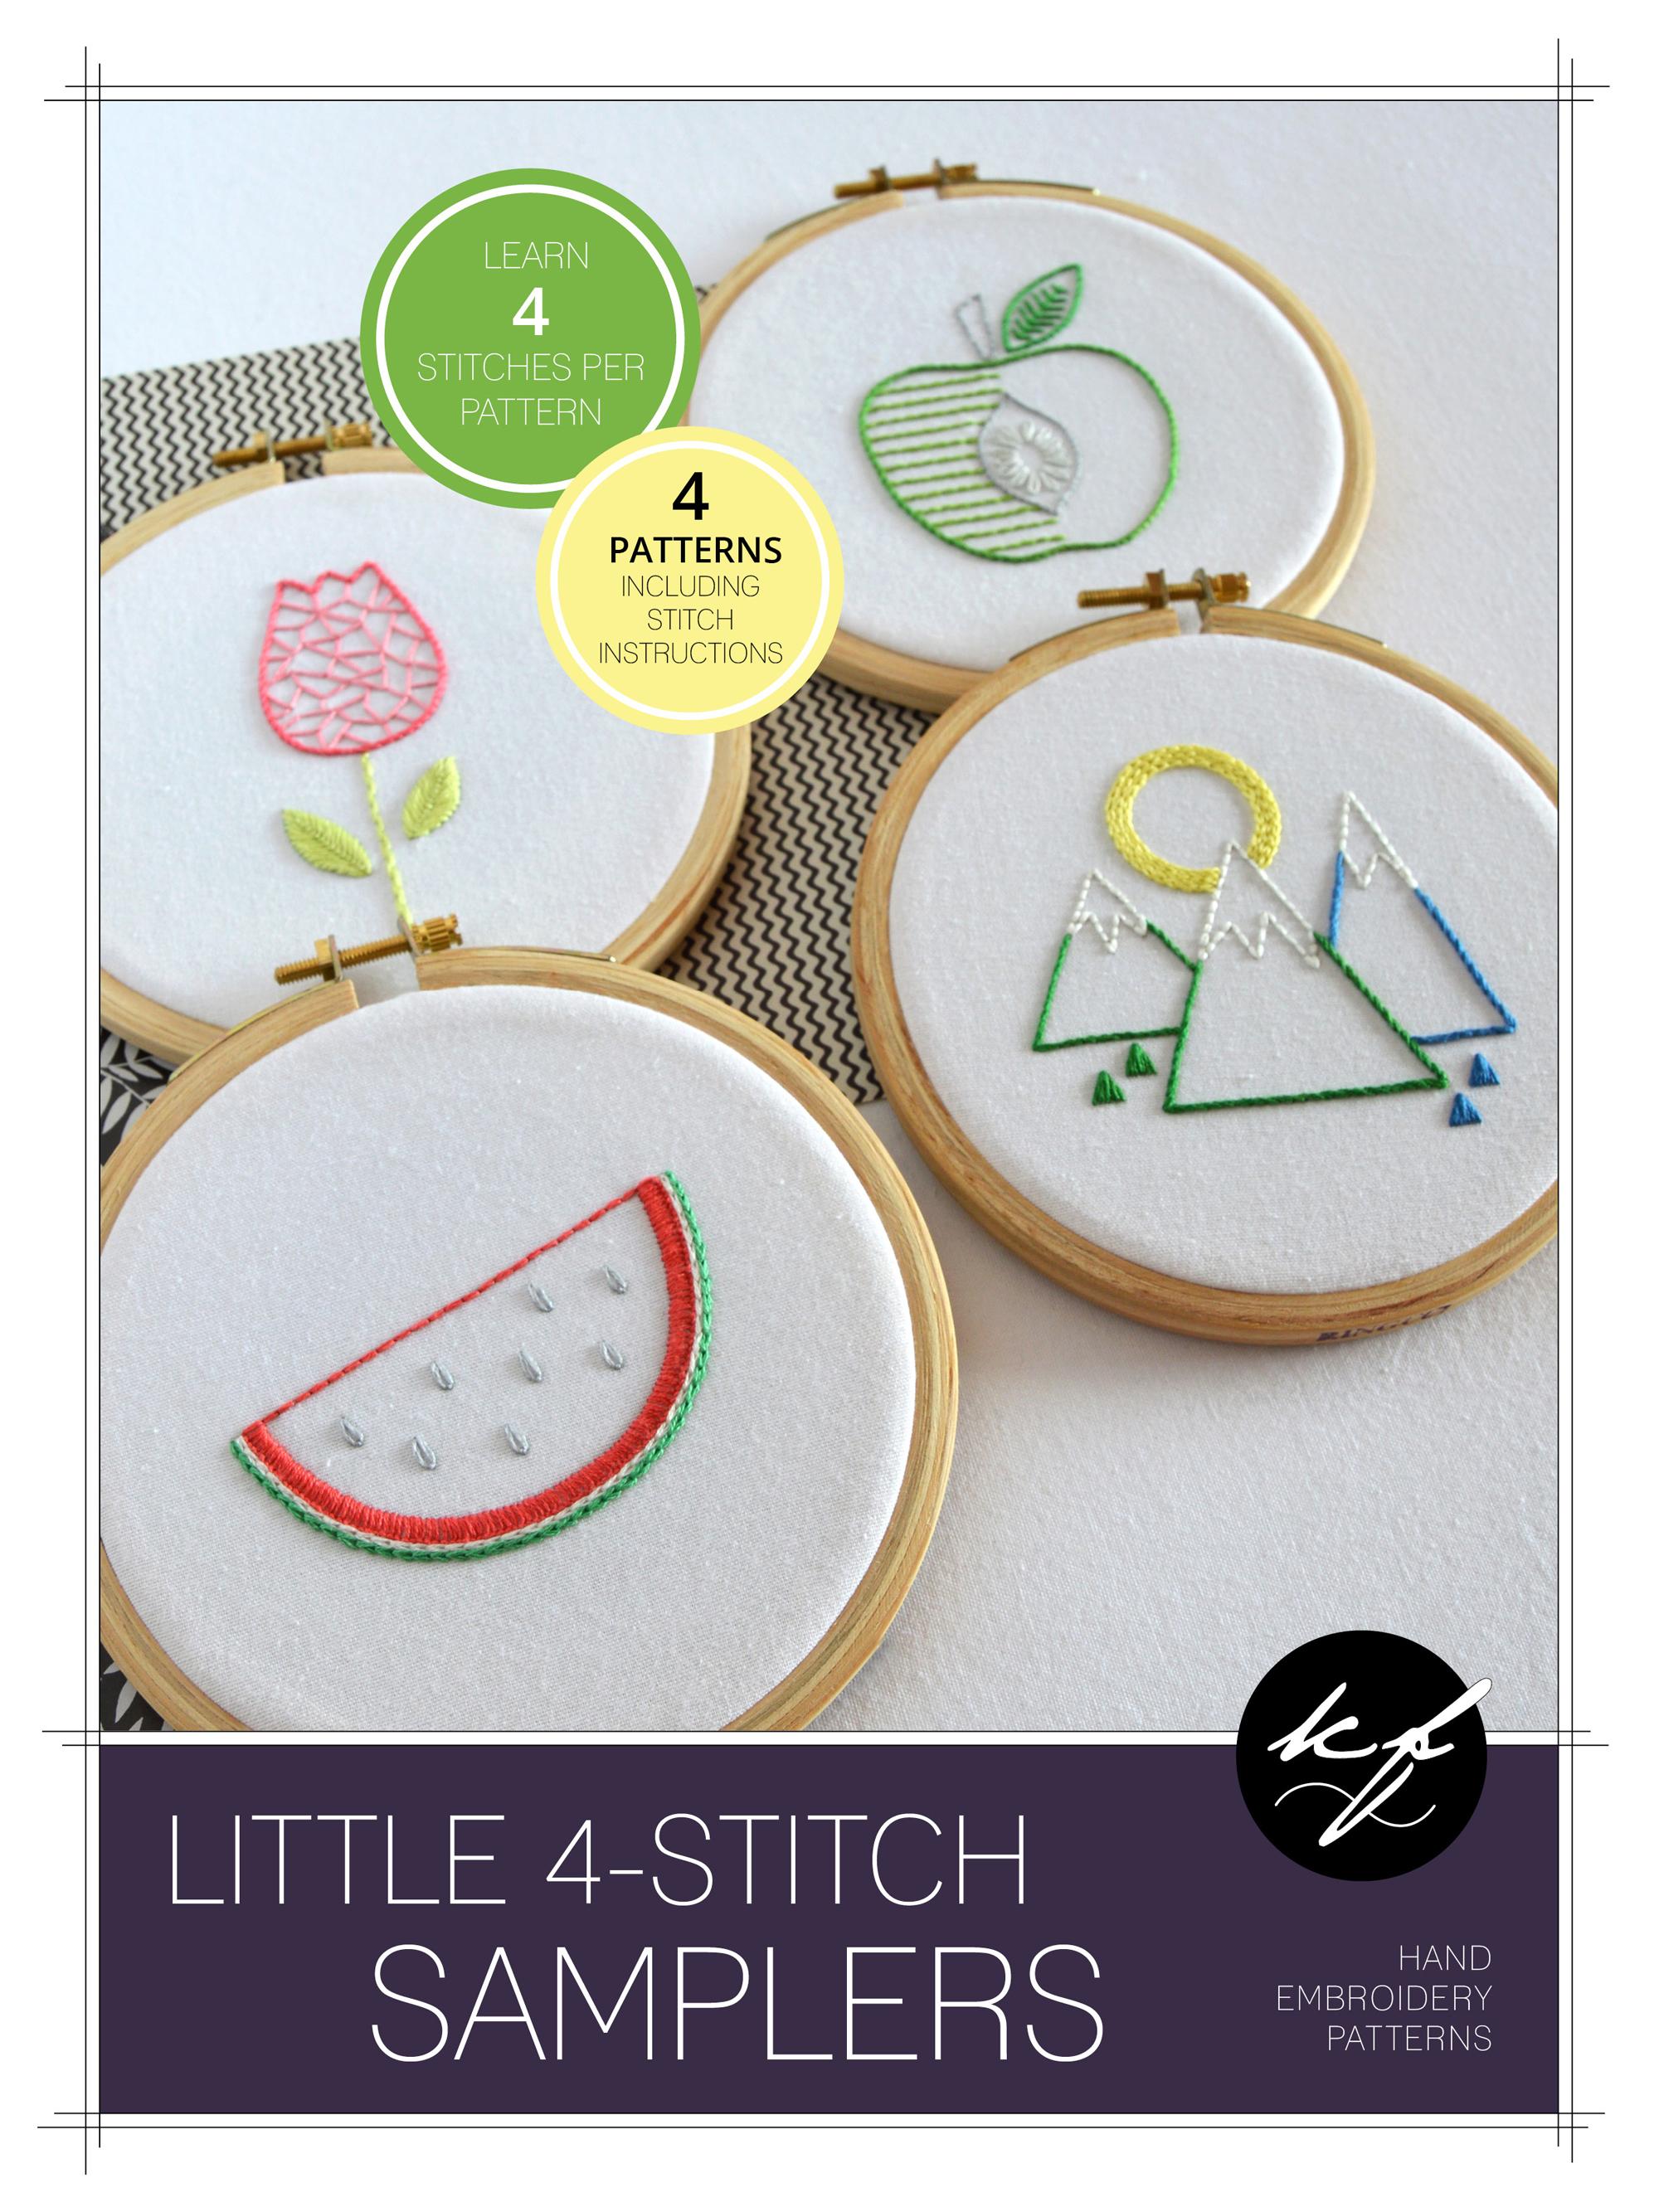 Little4StitchSamplersEmbroideryPattern_KellyFletcher.jpg